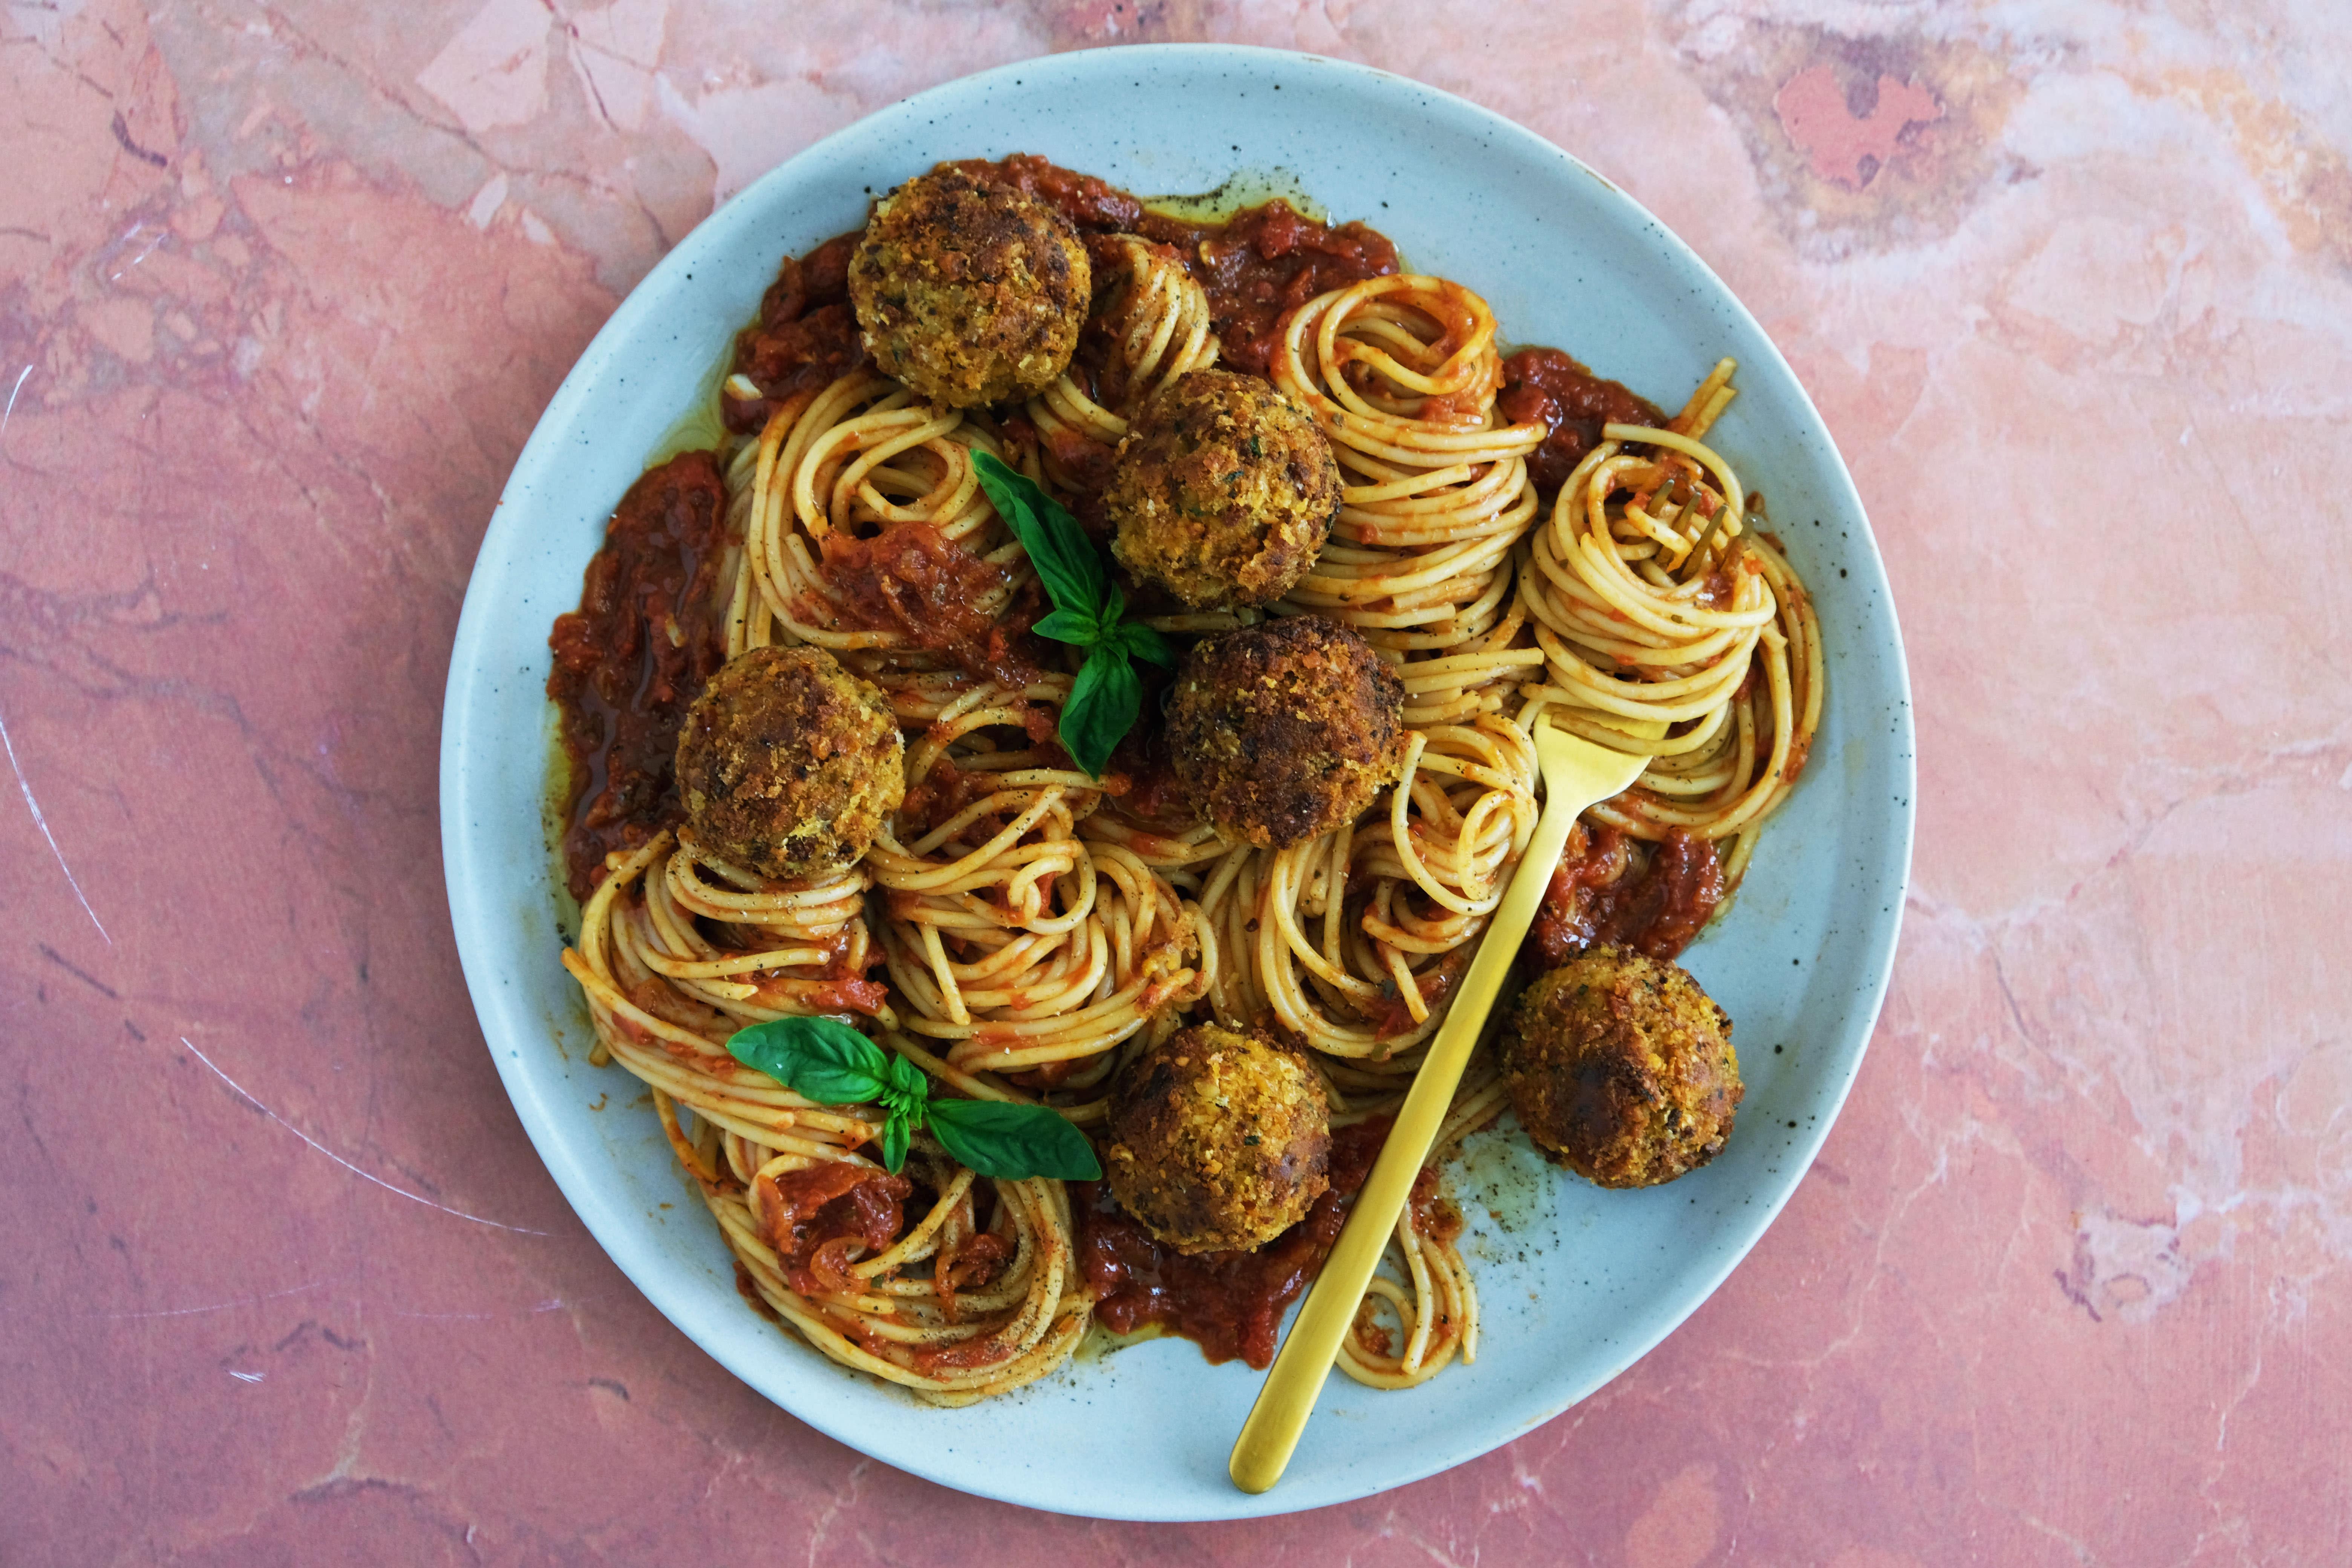 Sun-Dried Tomato and Chickpea 'Meatballs' with Spaghetti and Tomato Sauce